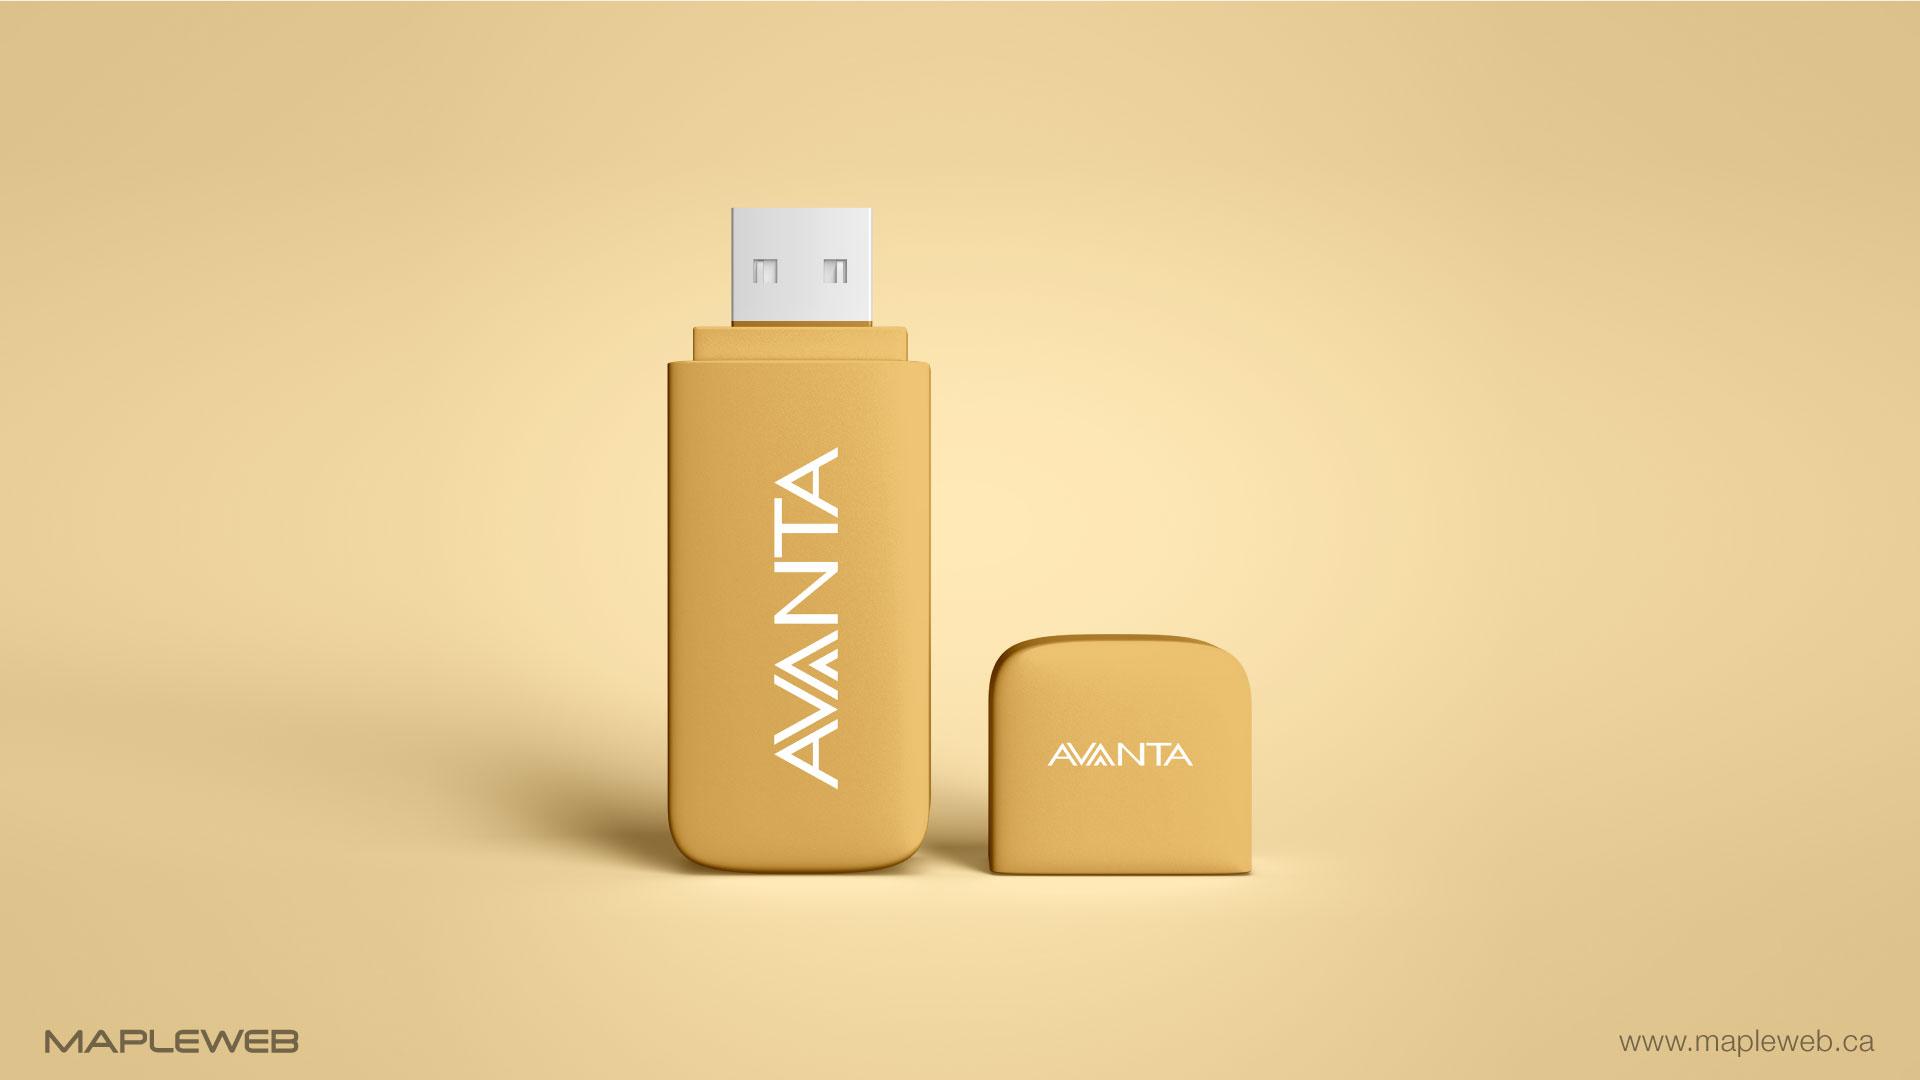 avanta-brand-logo-design-by-mapleweb-vancouver-canada-usb-mock